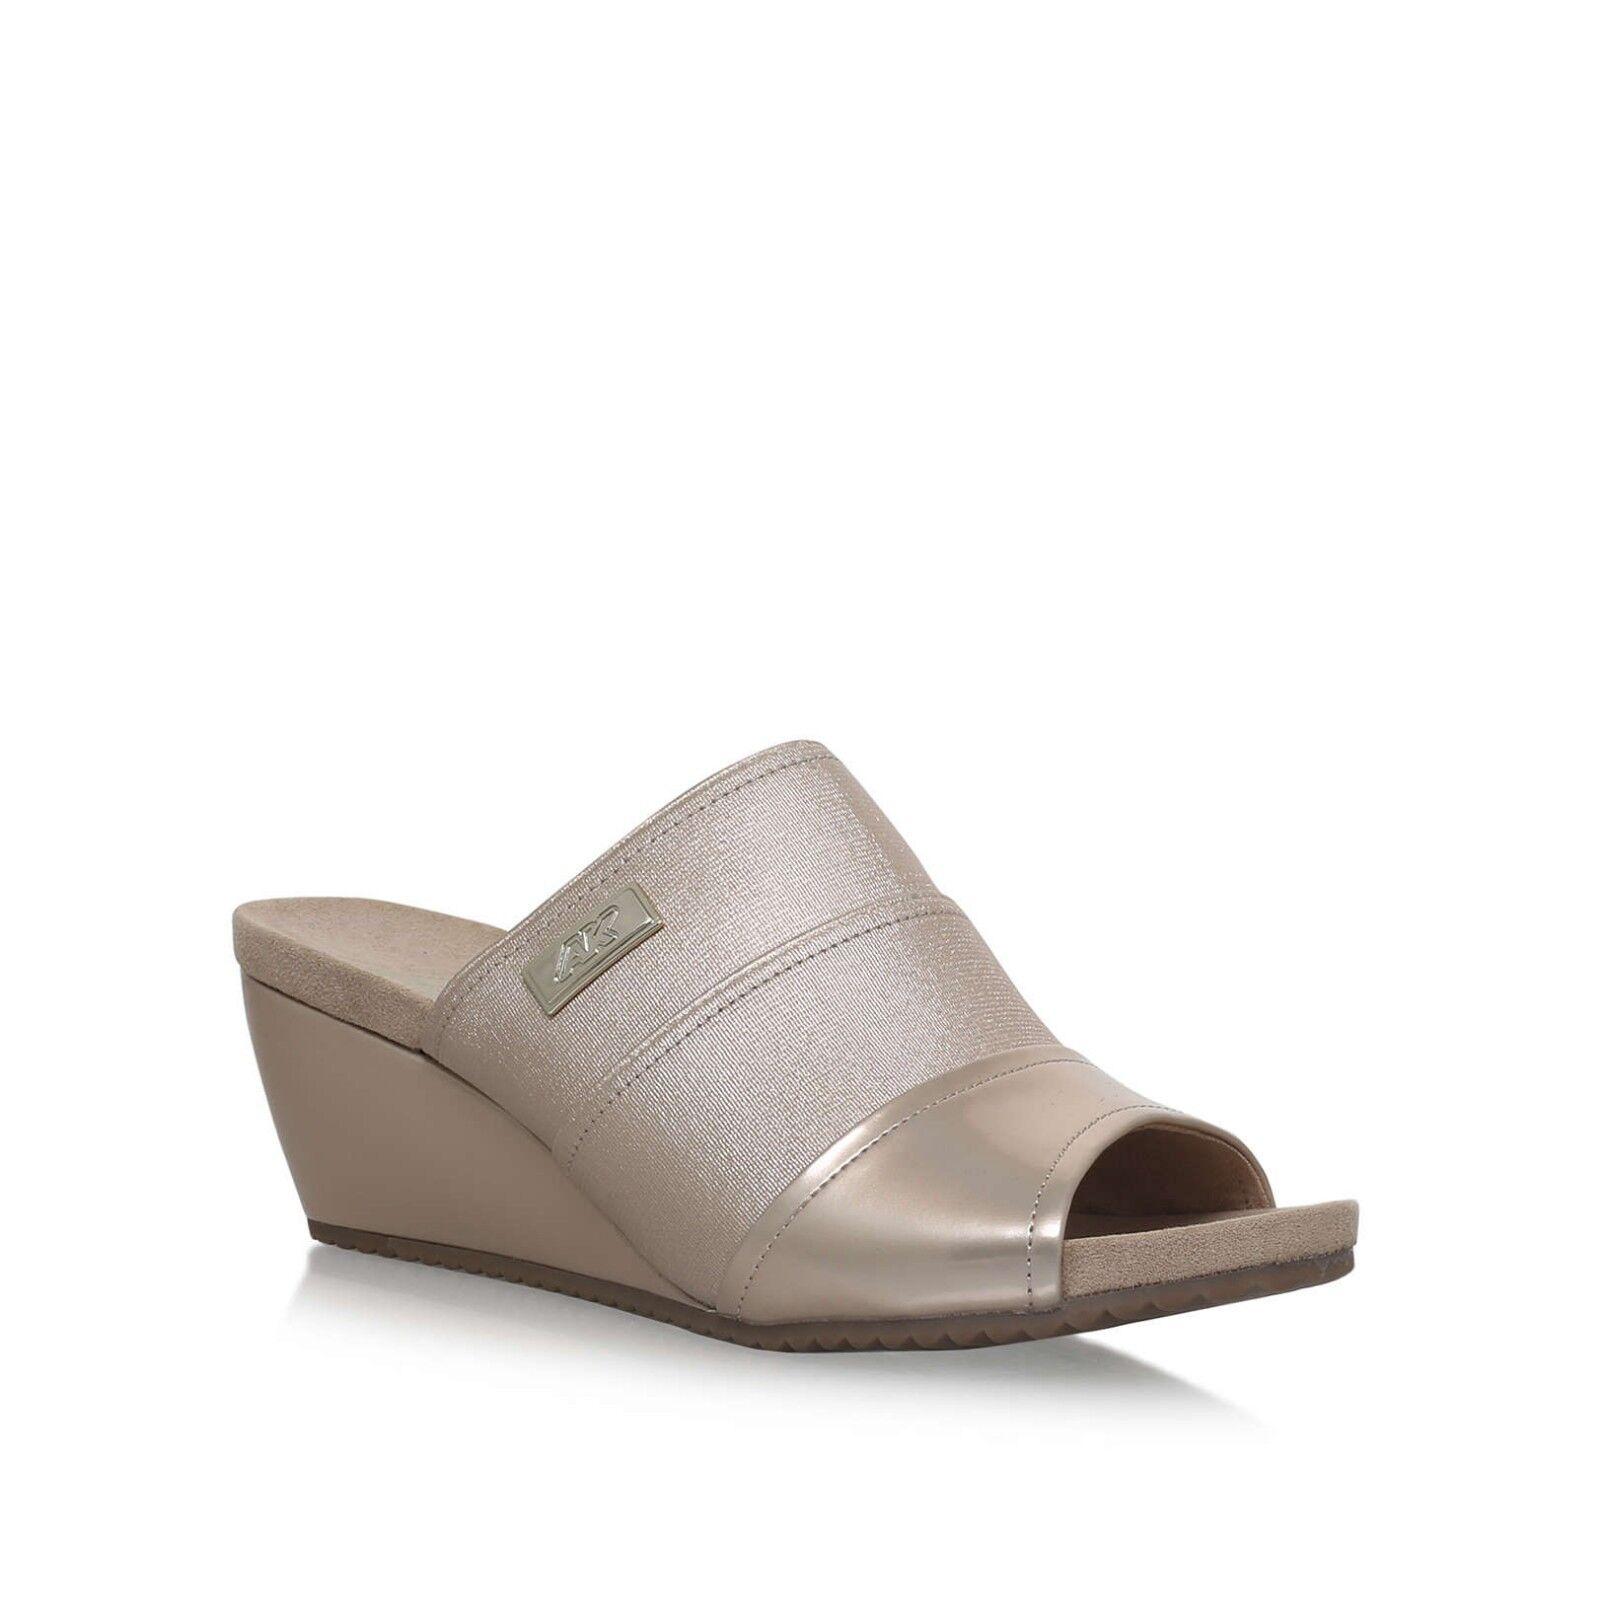 Anne Klein Chanay Mid Heel Heel Heel Sandals Shoes Size 9 BNWT RRP  Bone Freepost 8b4267